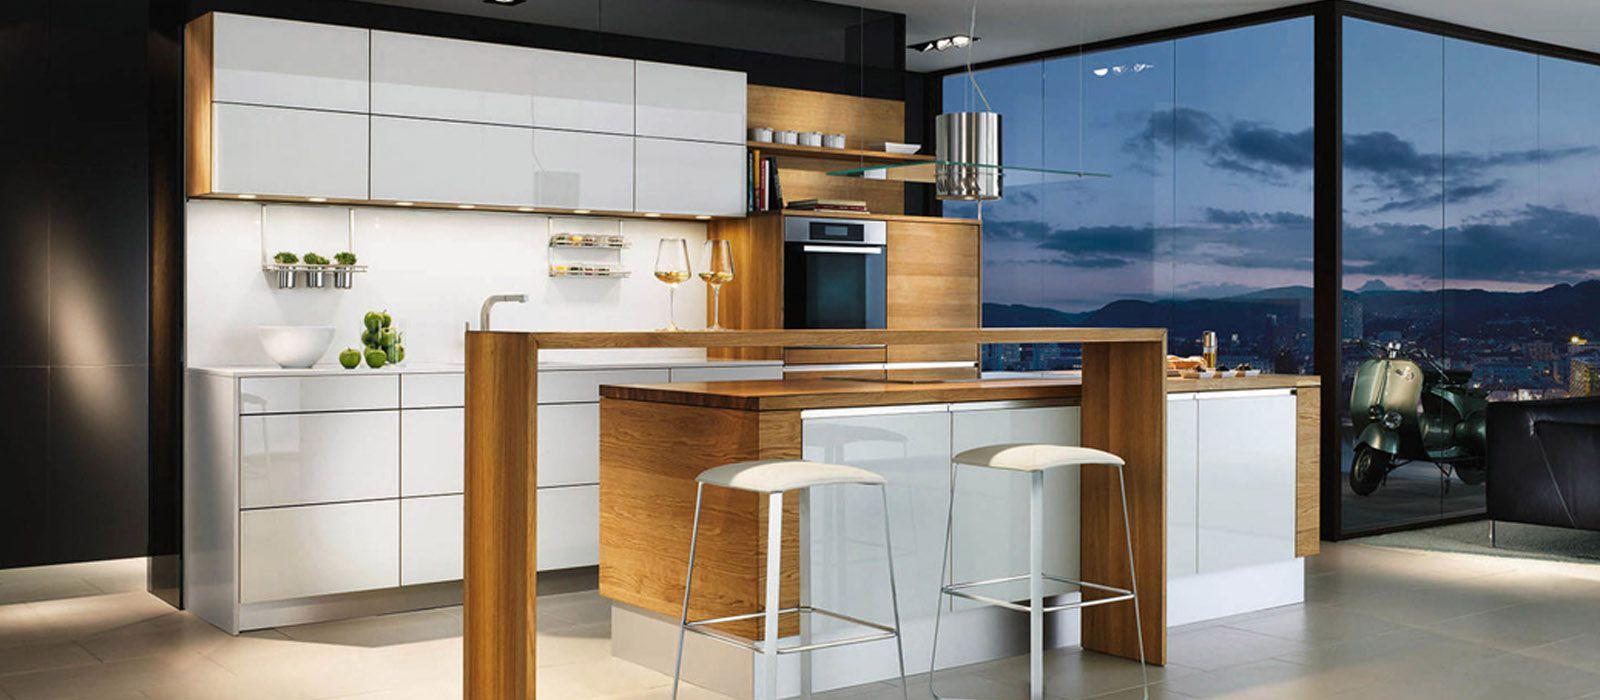 interior design ideas gut reno of park slope townhouse brownstoner